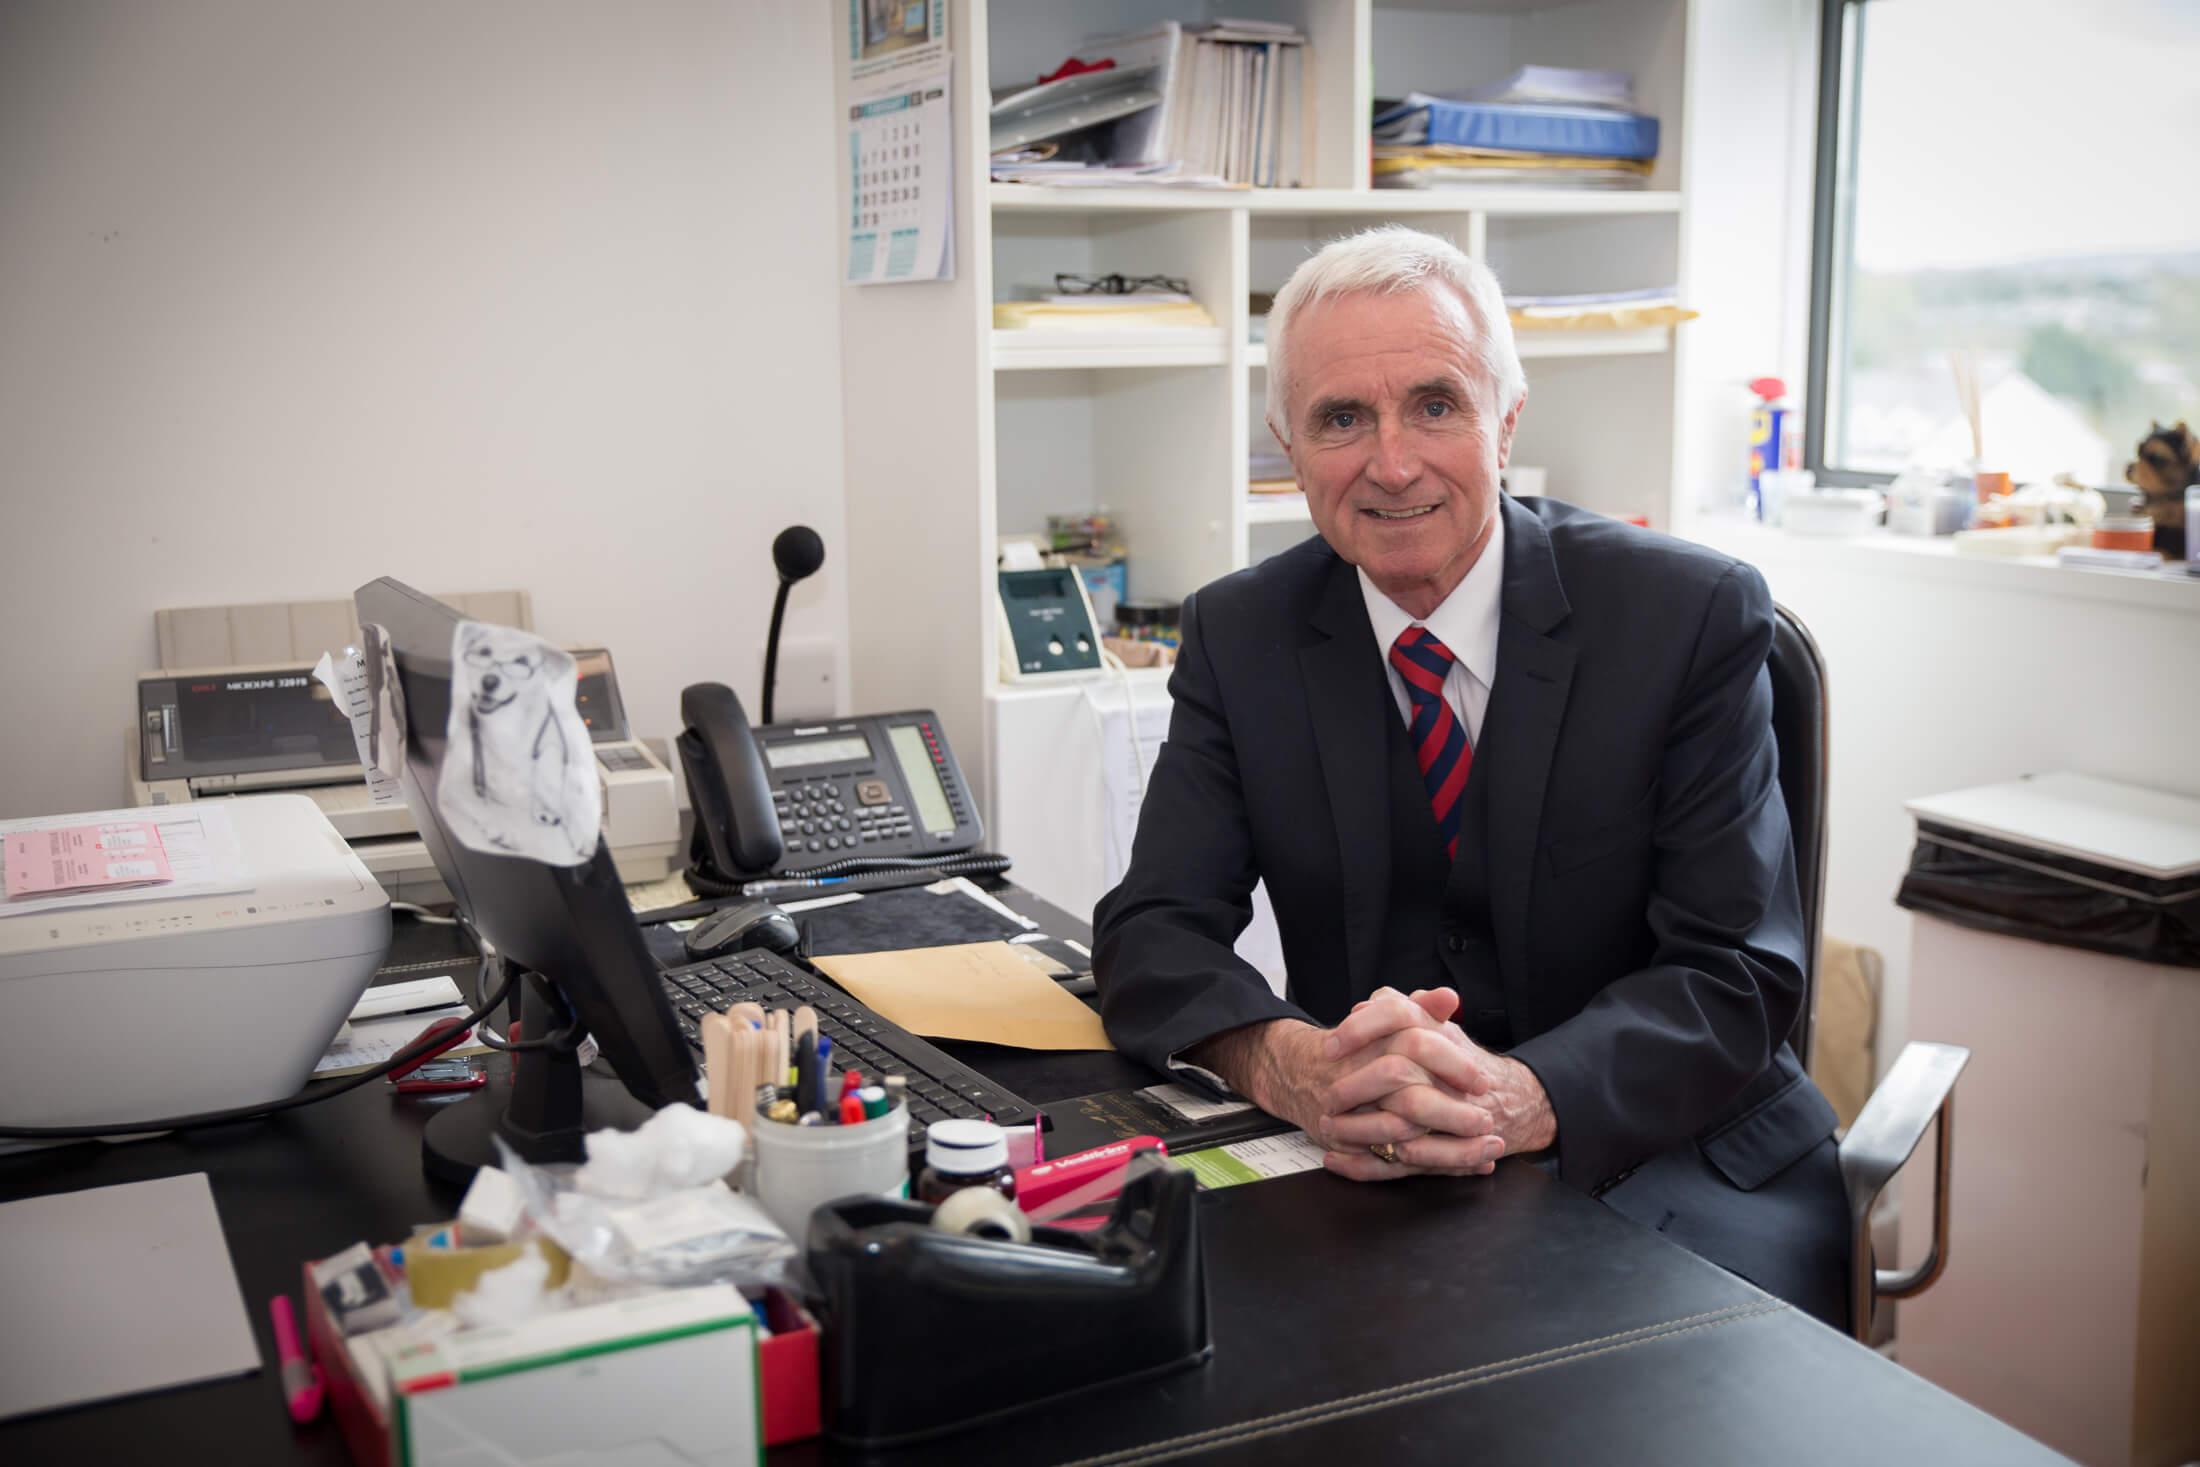 Scally, McDaid Roarty Medical Practice Reception - Dr. Jim McDaid